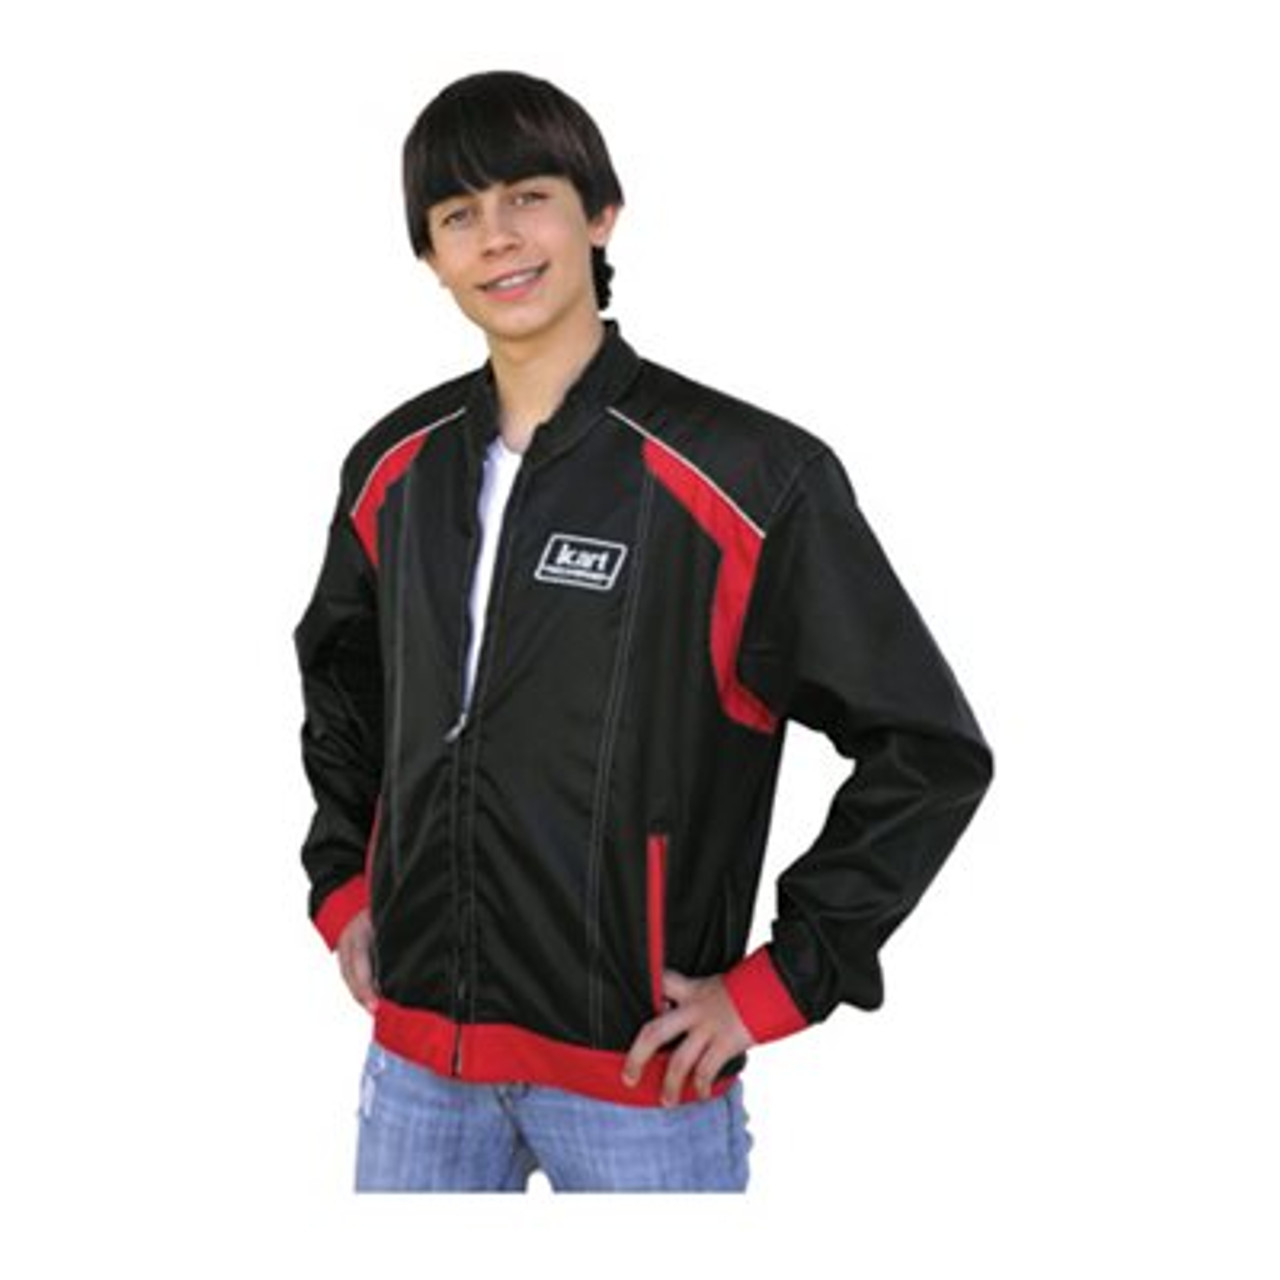 Kart Racewear karting jacket, adult XX-large